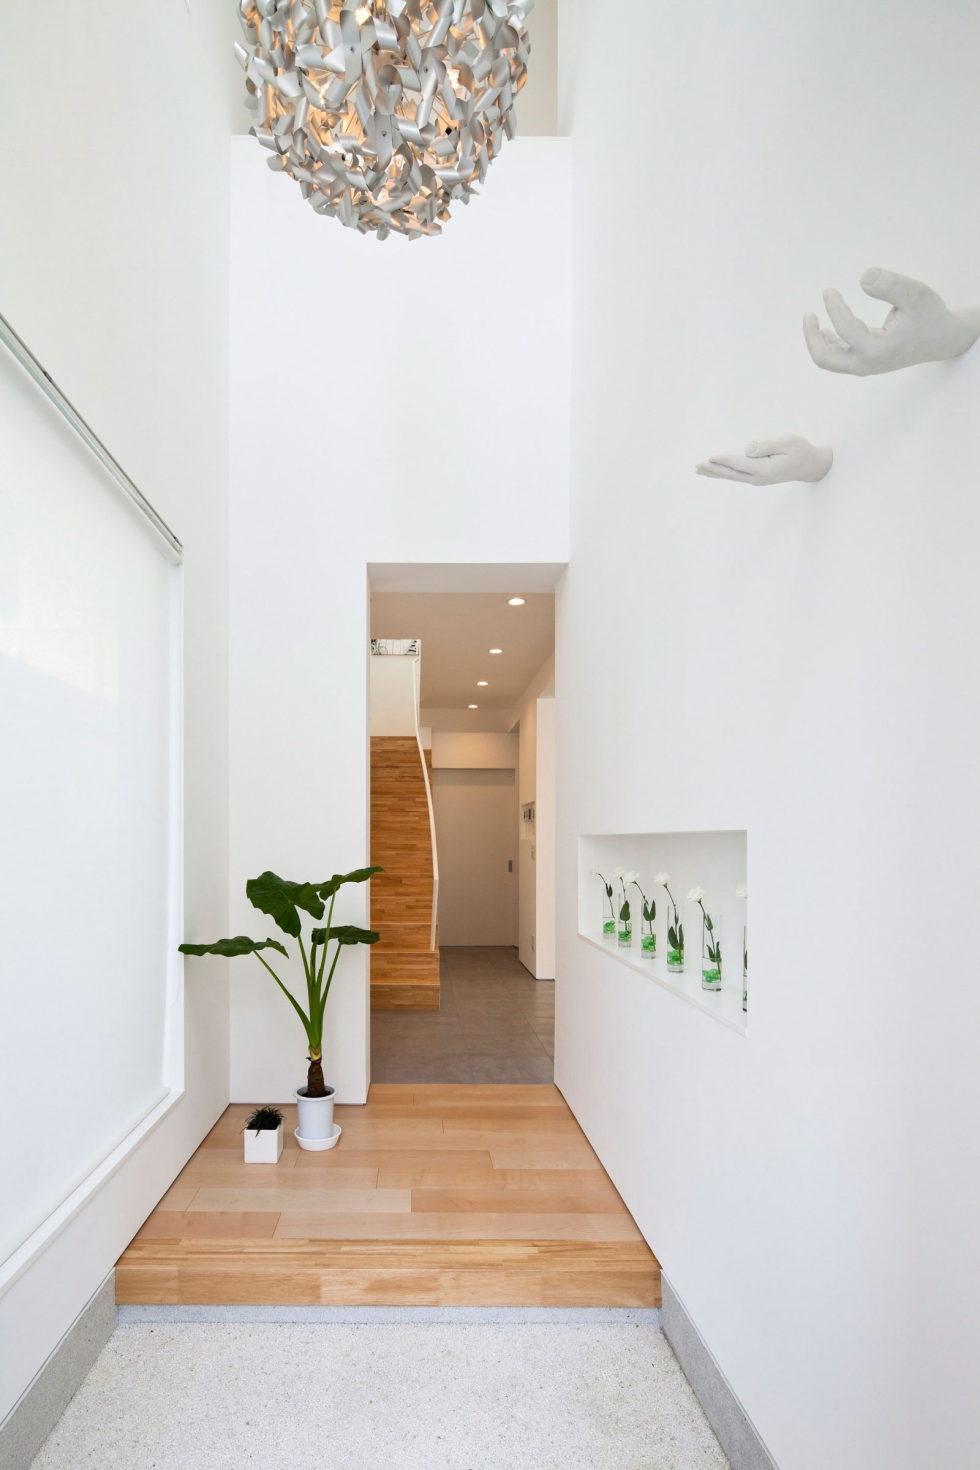 Zen Design House From RCK Design Studio In Japan 3